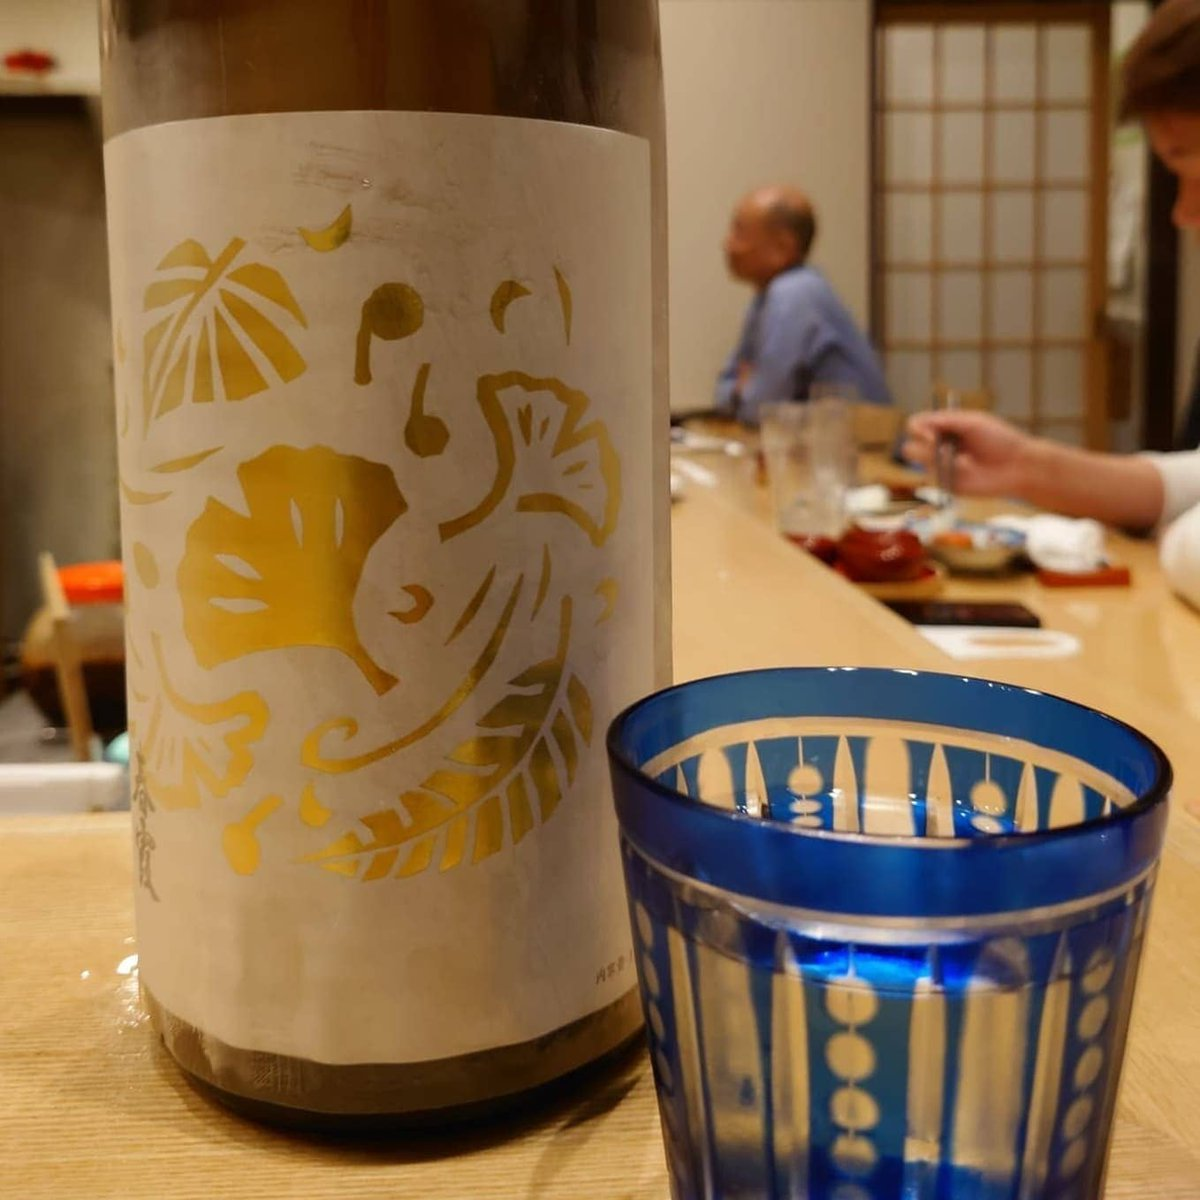 test ツイッターメディア - 今日の秋田の日本酒 栗林酒造店「春霞 純米酒 木の葉ラベル」 精米歩合80%とは思えないすっきりとした味わい https://t.co/cEv7qlW4ES https://t.co/FiCAqJcPPA